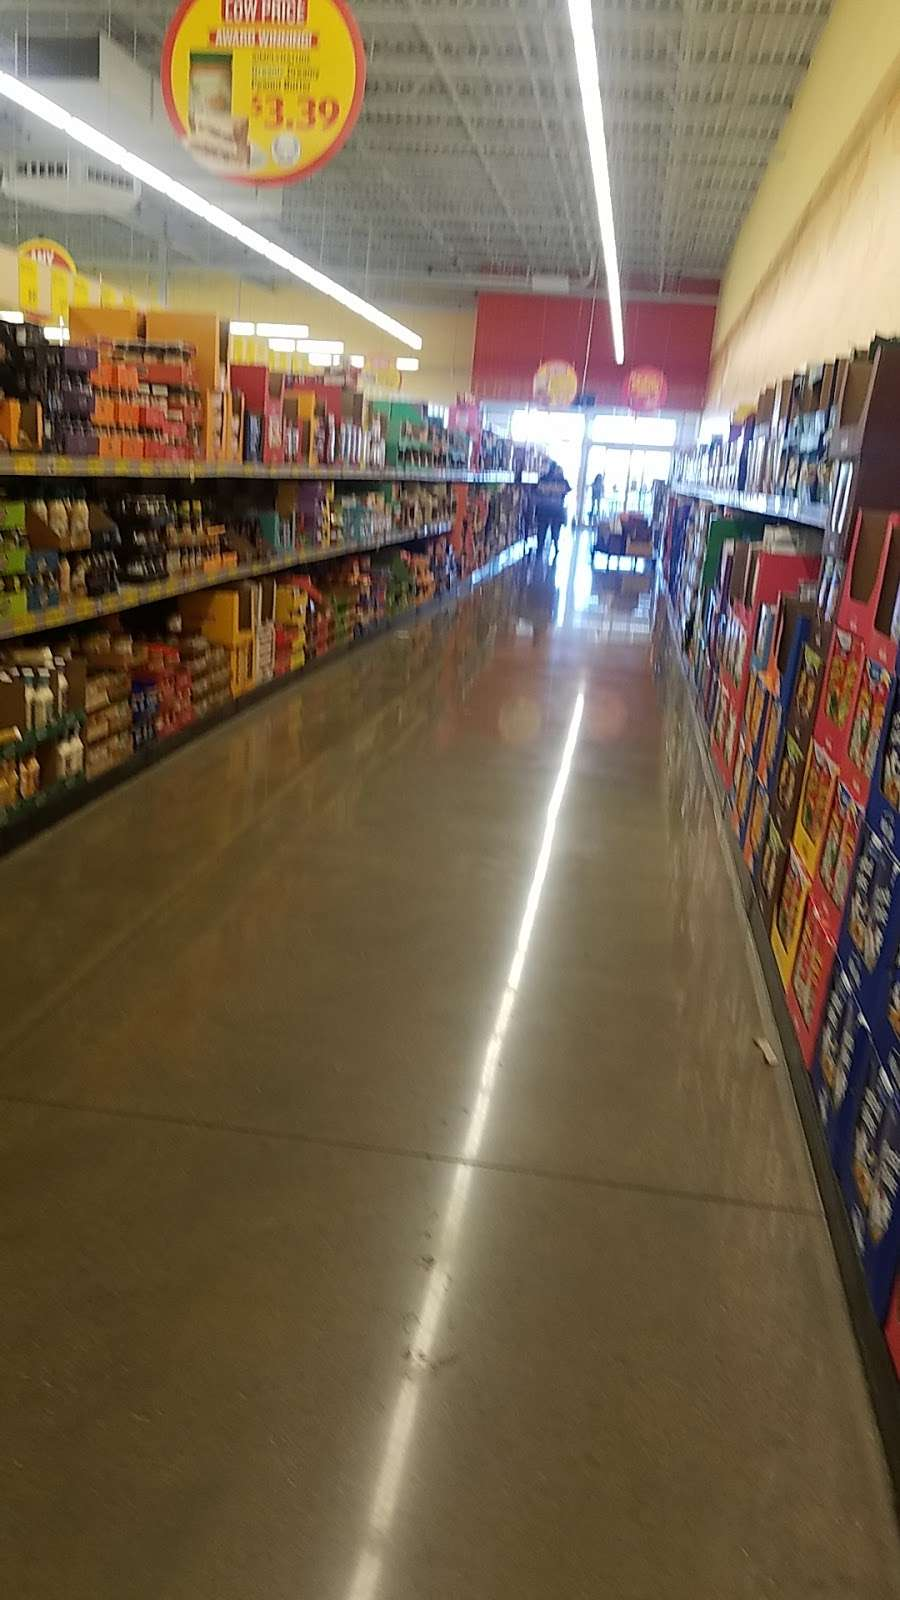 ALDI - supermarket  | Photo 5 of 10 | Address: 1038 N Rohlwing Rd, Addison, IL 60101, USA | Phone: (855) 955-2534